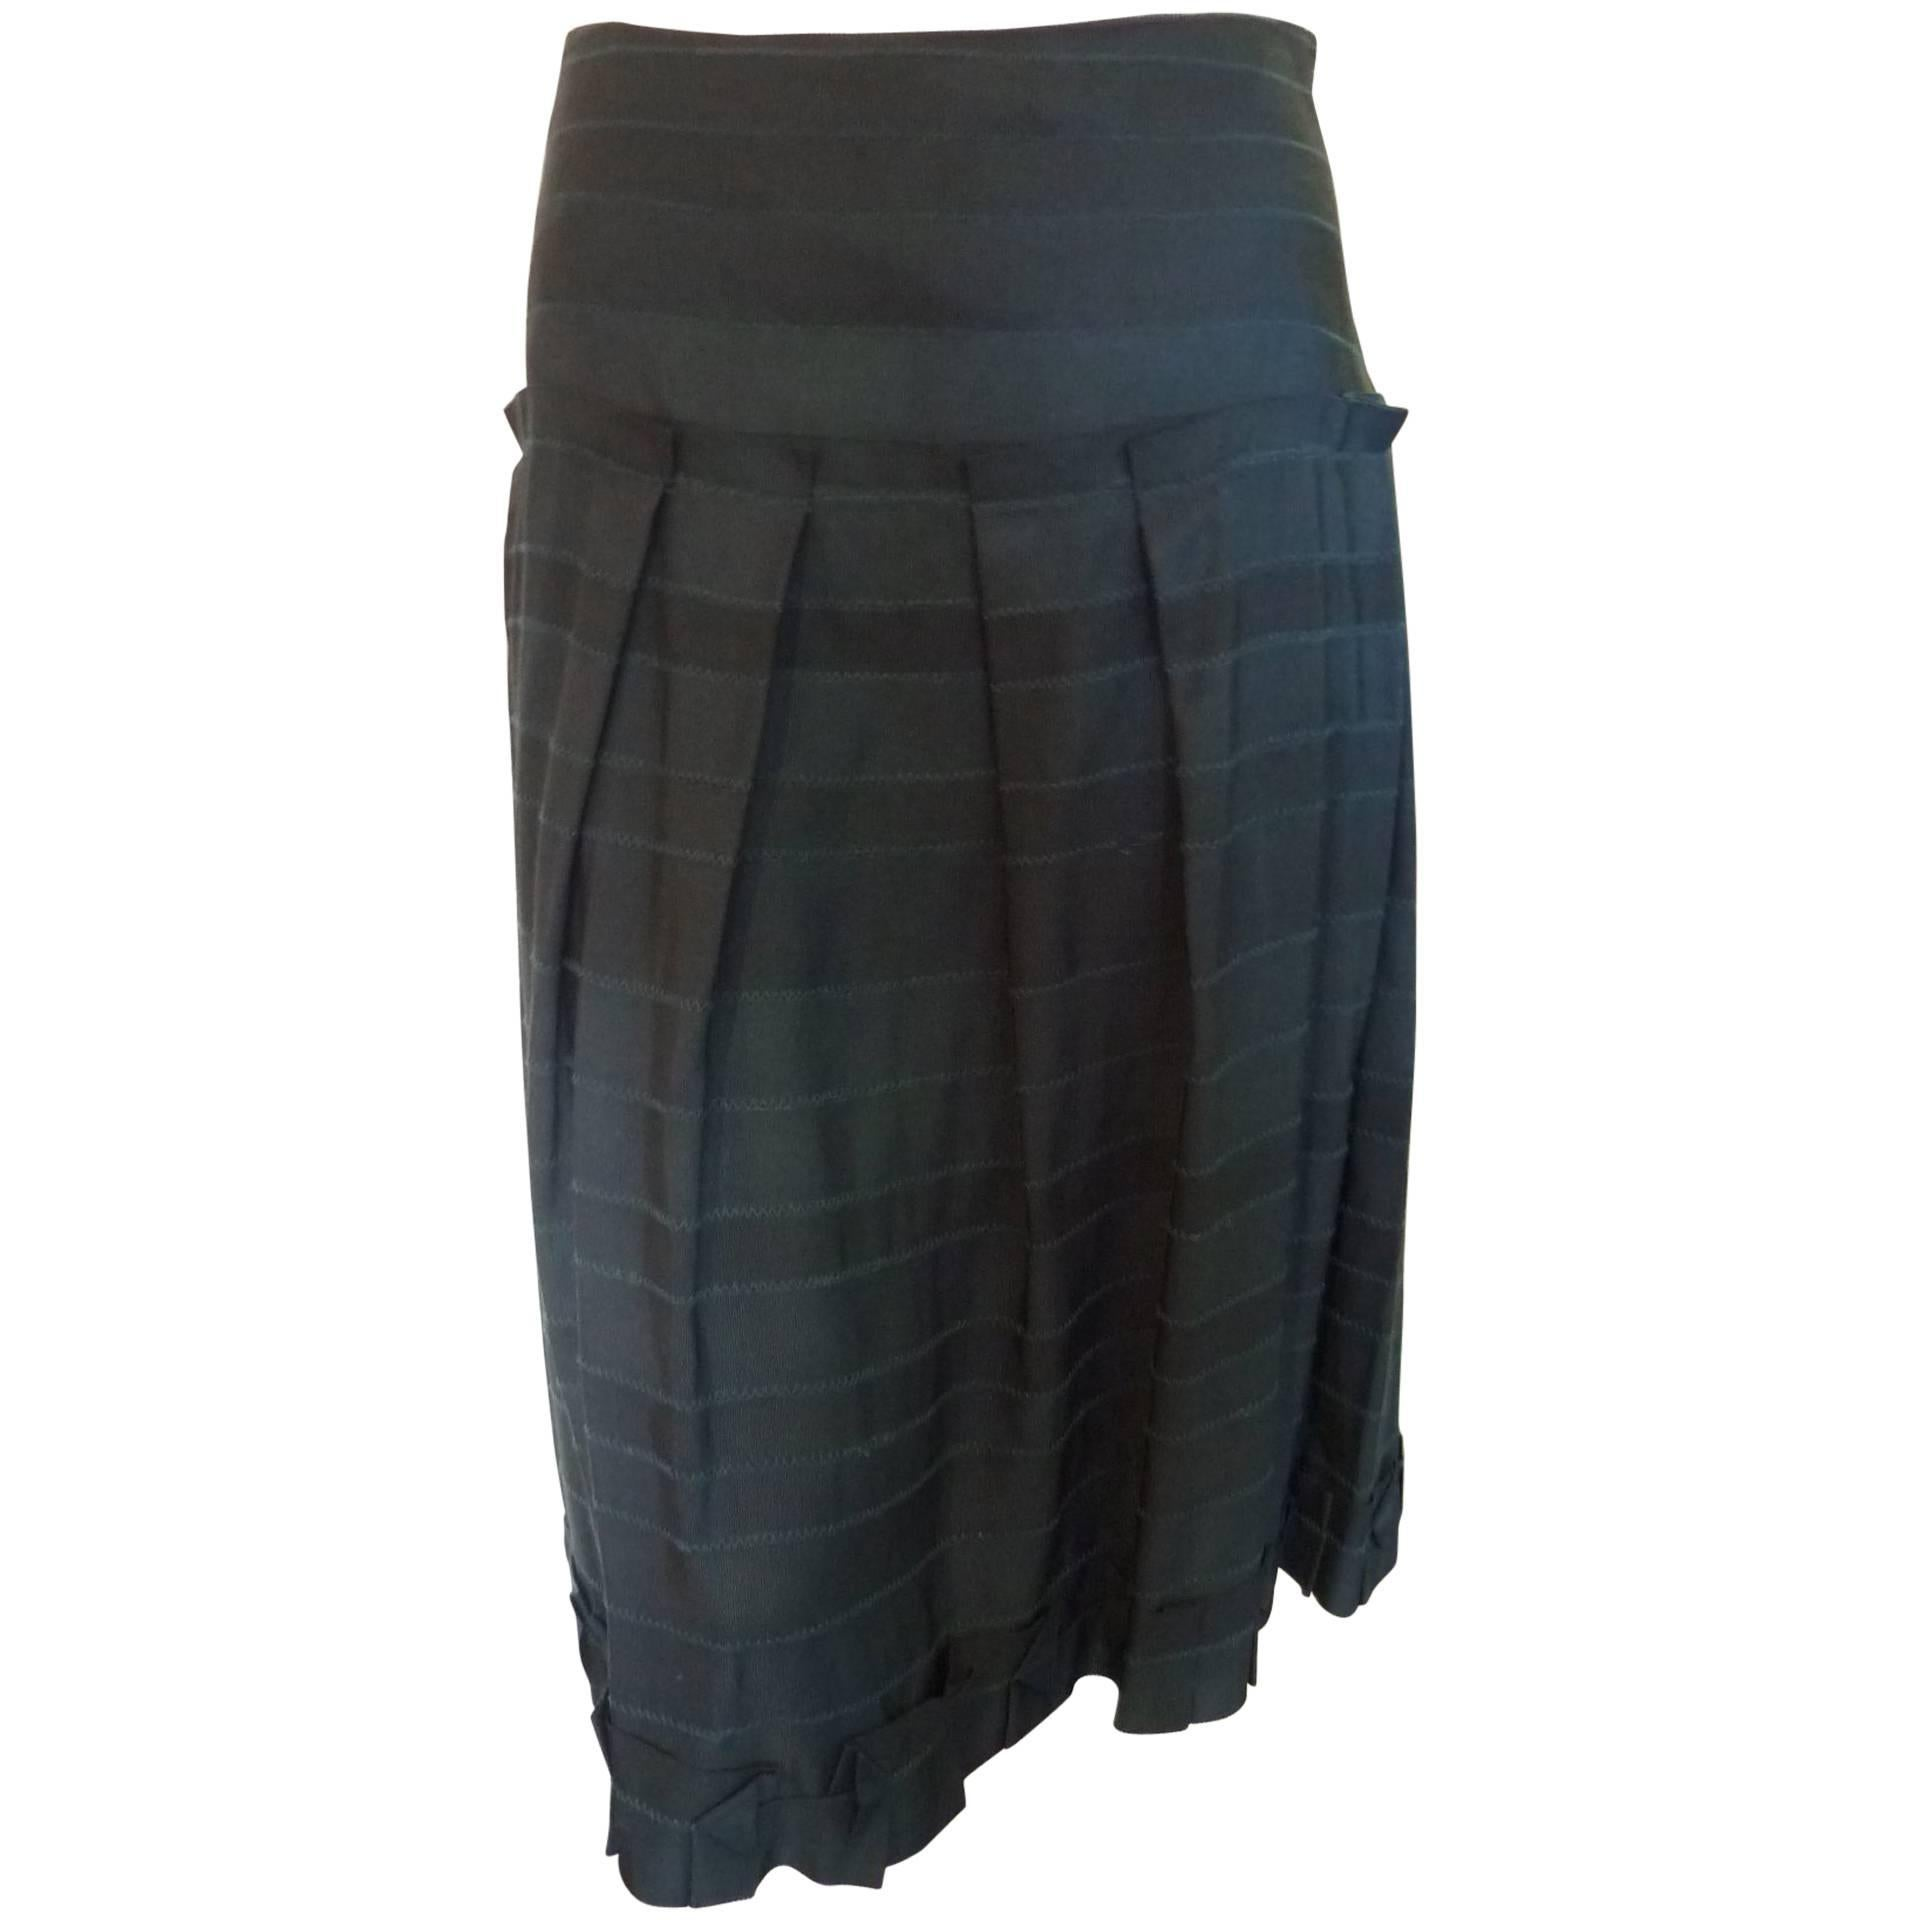 Lela Rose Dark Green Skirt with Origami Details (4)